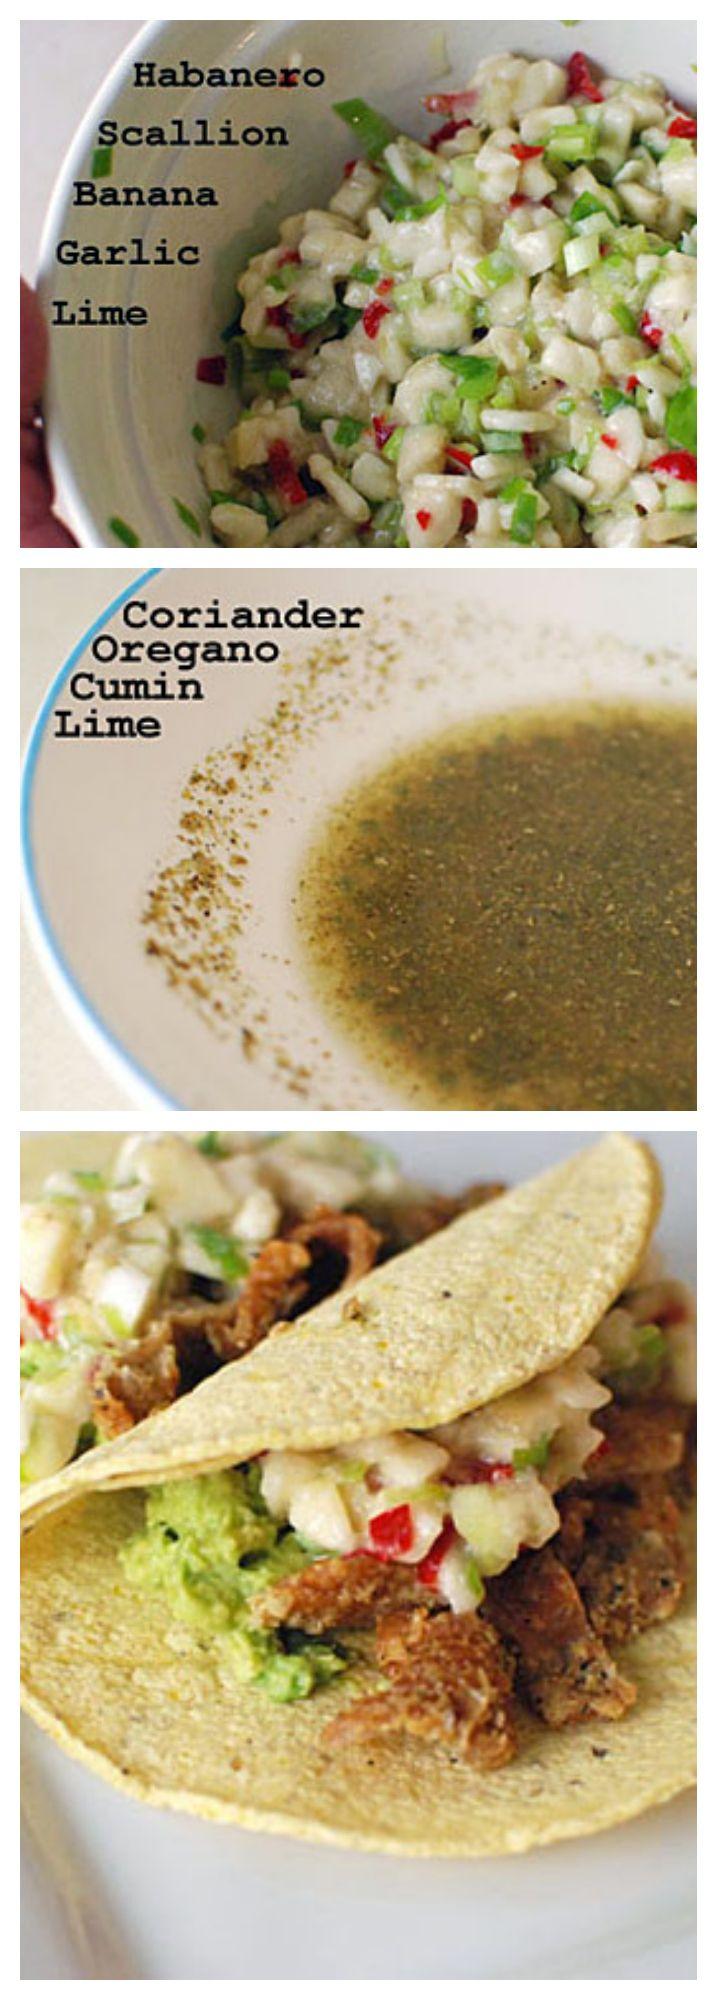 Chicken Skin Tacos with Habanero Banana Salsa | Recipe